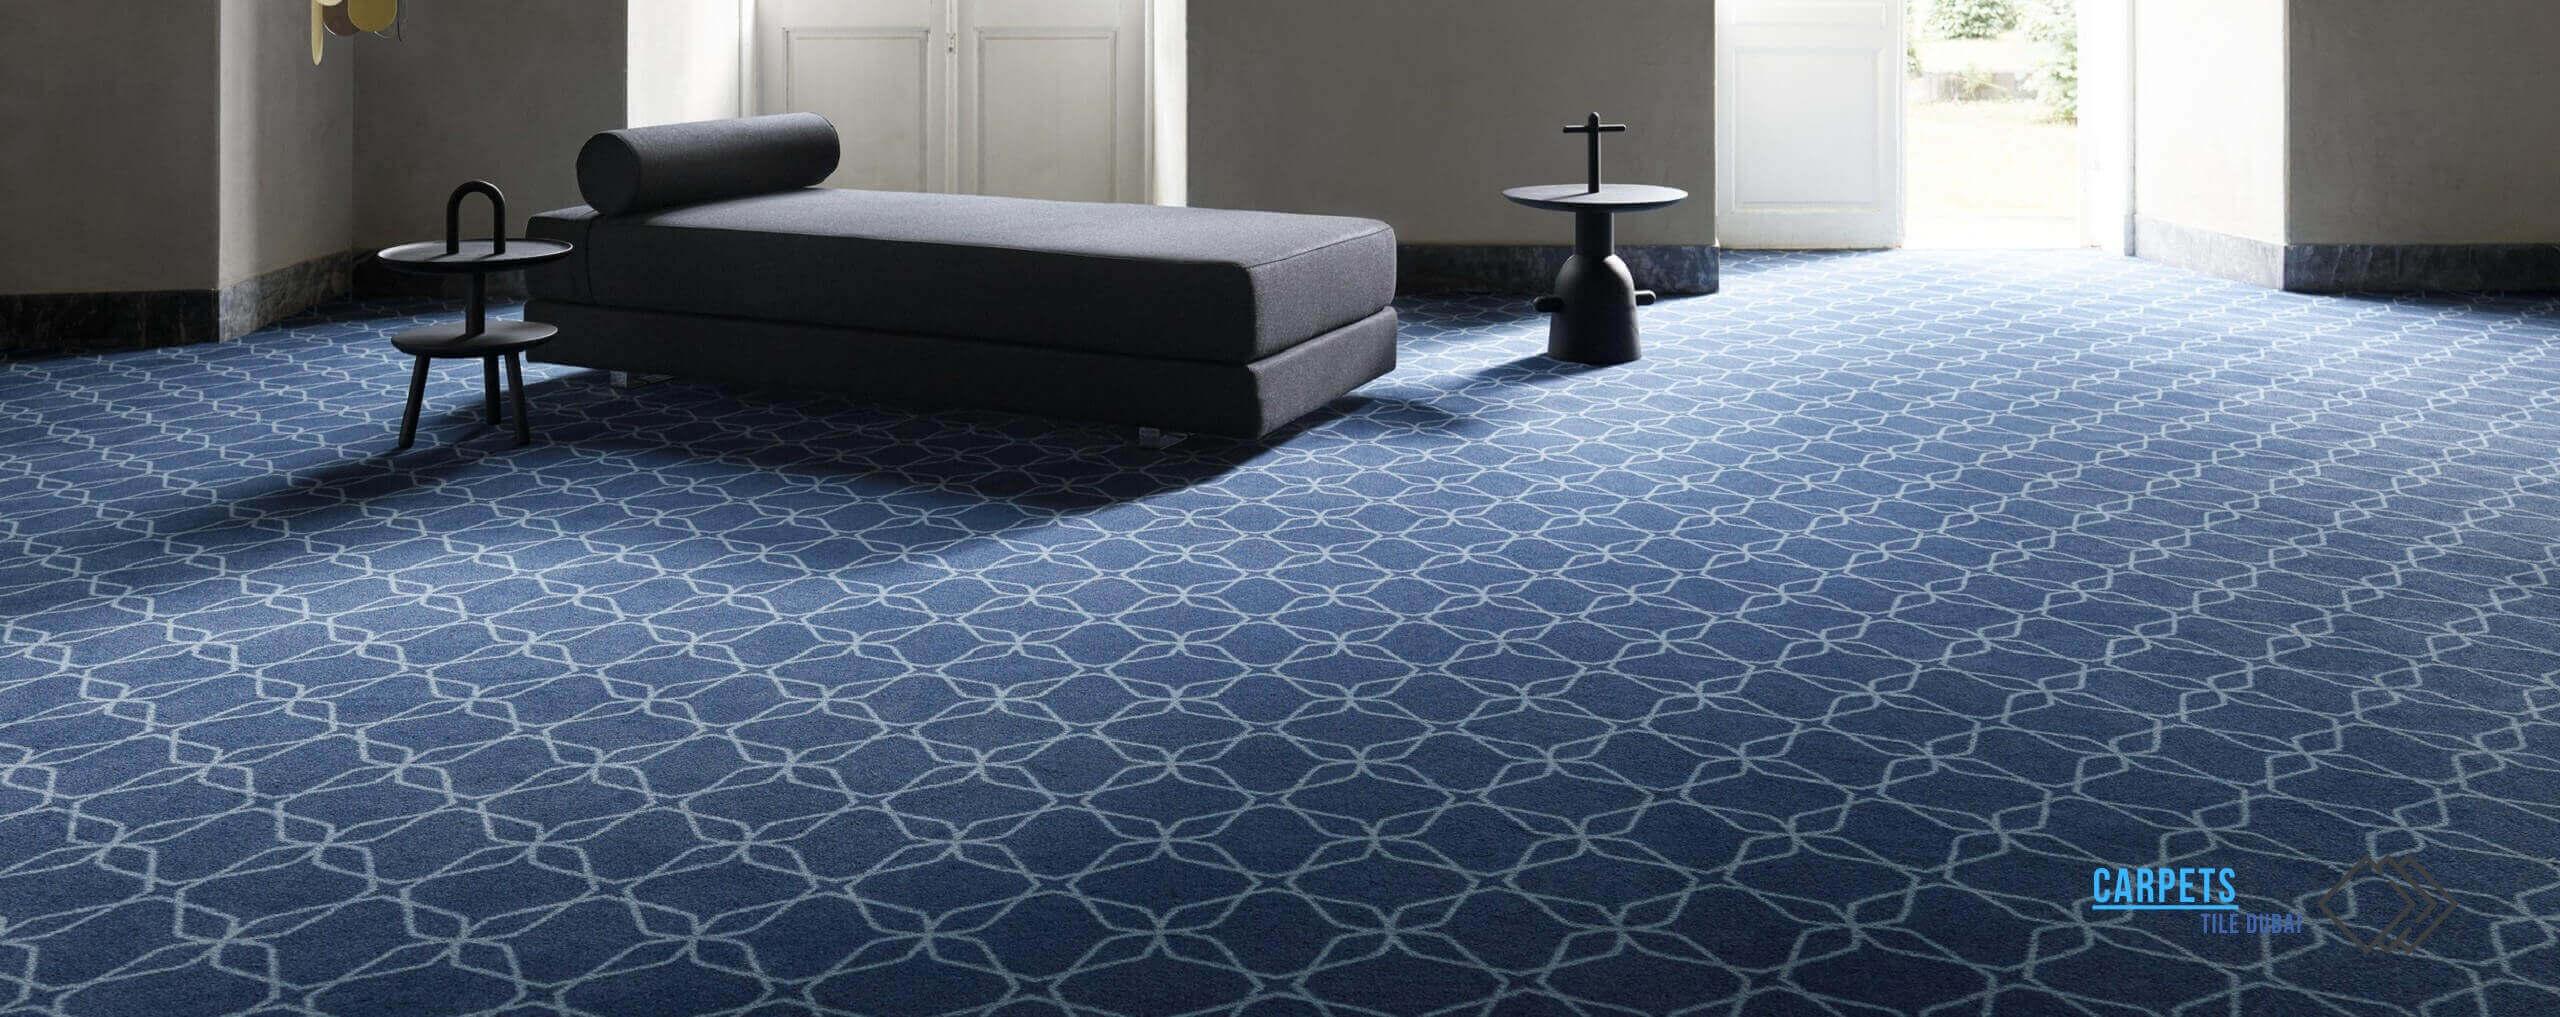 Wall to Wall carpets in dubai